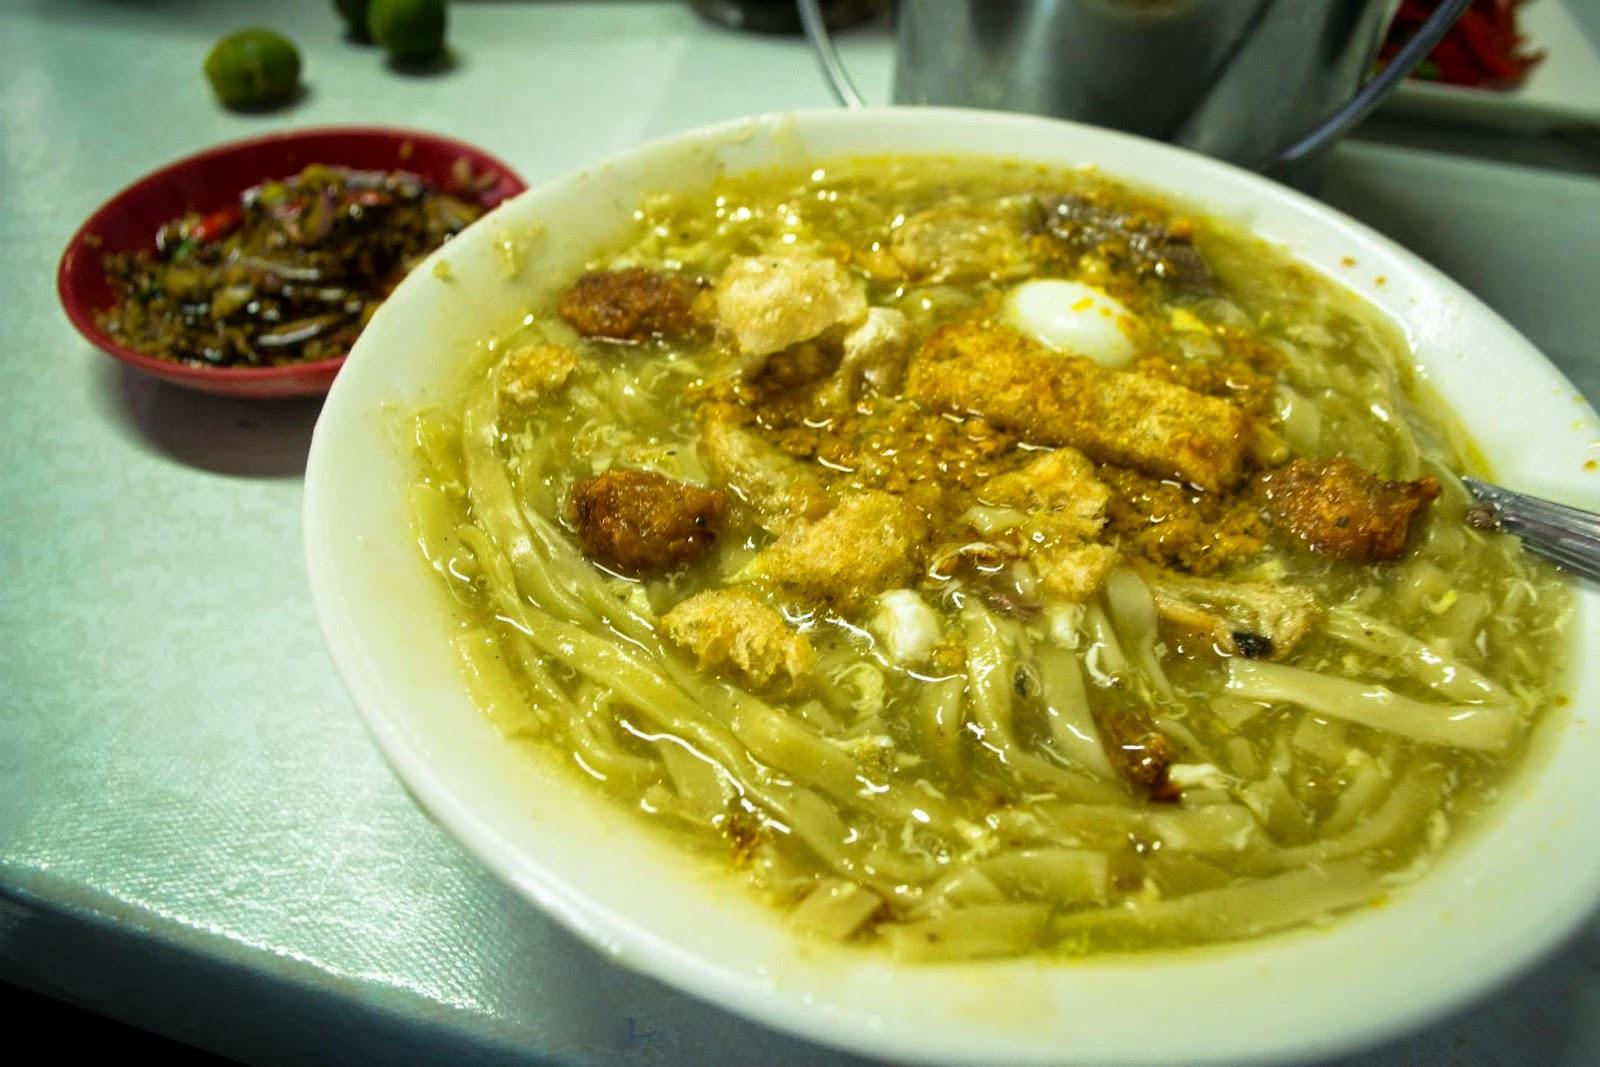 Loming Batangas of Salaban's Best